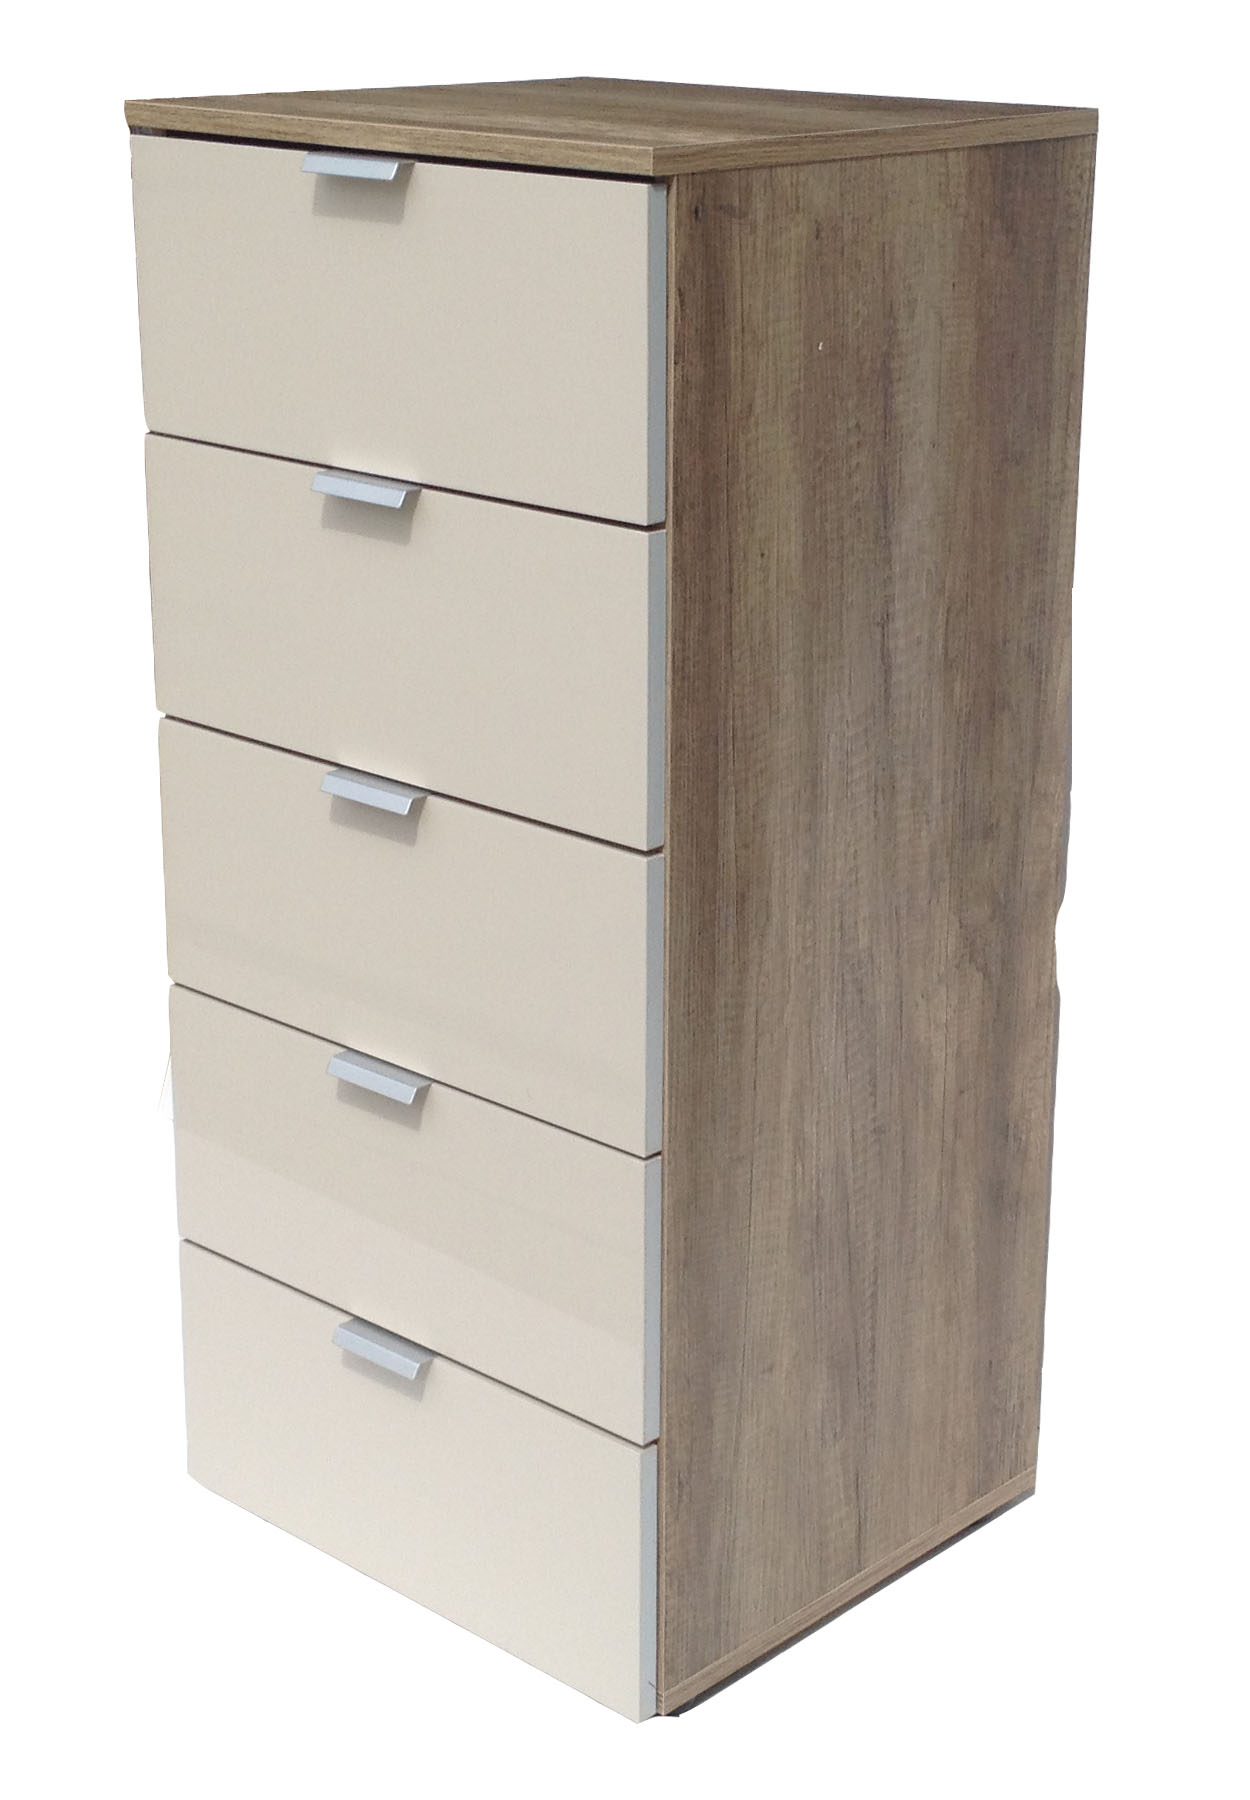 kommode highboard flurkommode 5 schubladen wildeiche sand. Black Bedroom Furniture Sets. Home Design Ideas